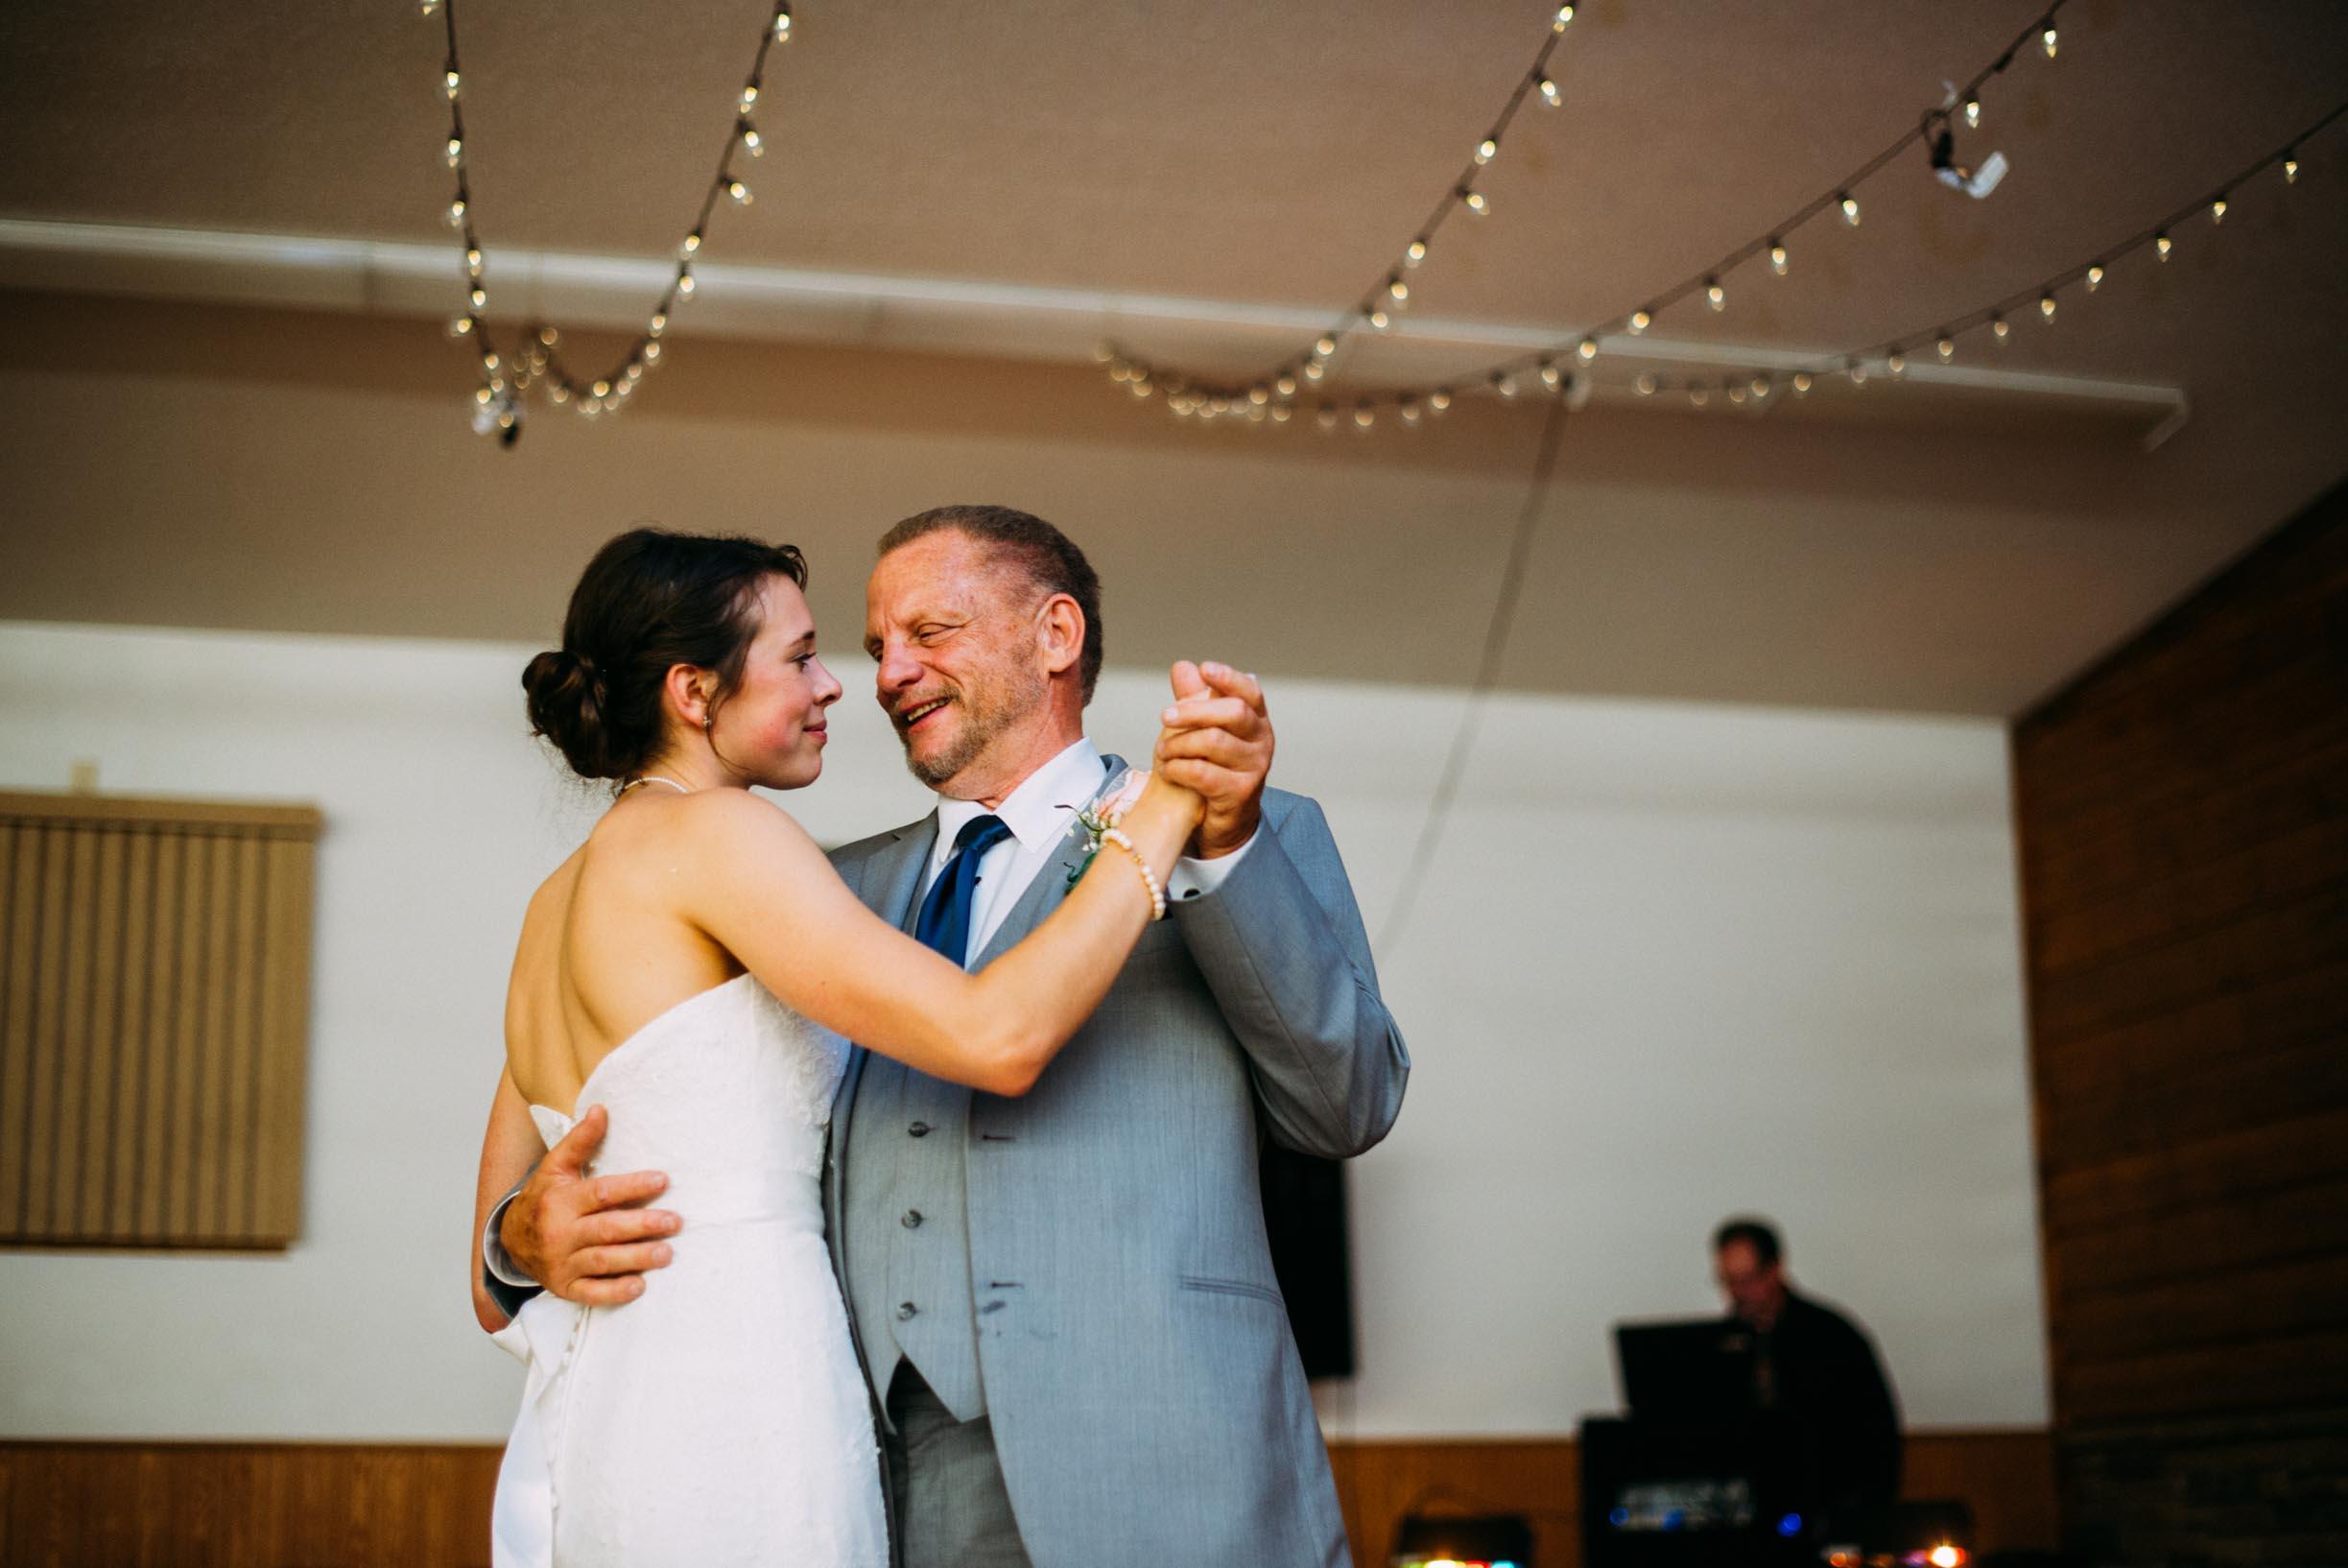 41-Lindsey Jake Wedding Reception Winona_.jpg